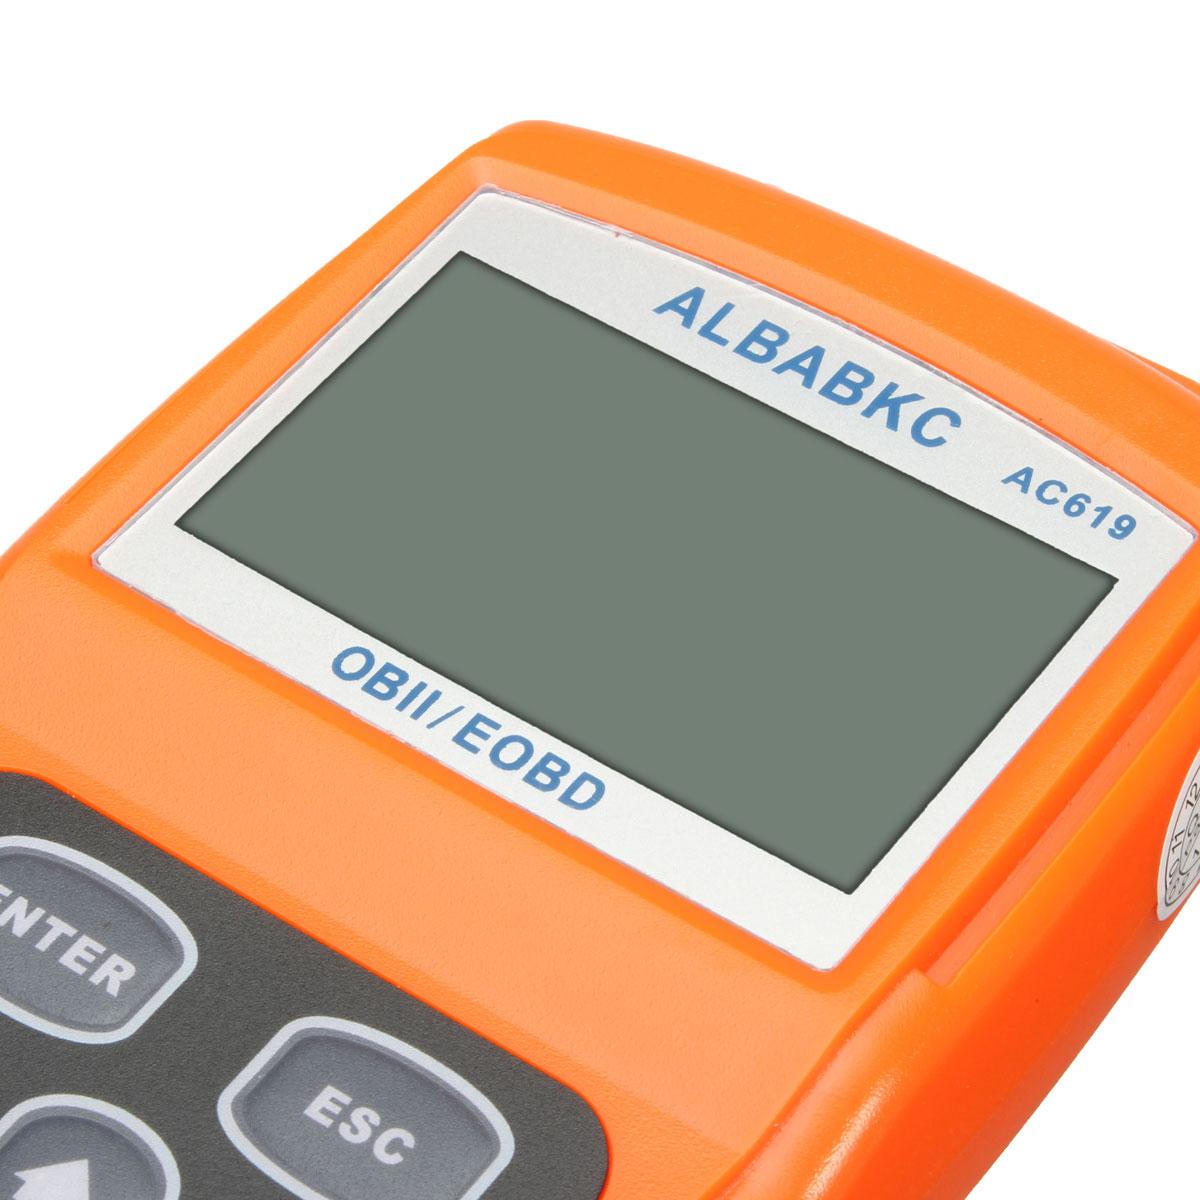 ALBABKC AC619 OBDII OBD2 EOBD Auto Fault Car Diagnostic Scanner Code Reader Tool